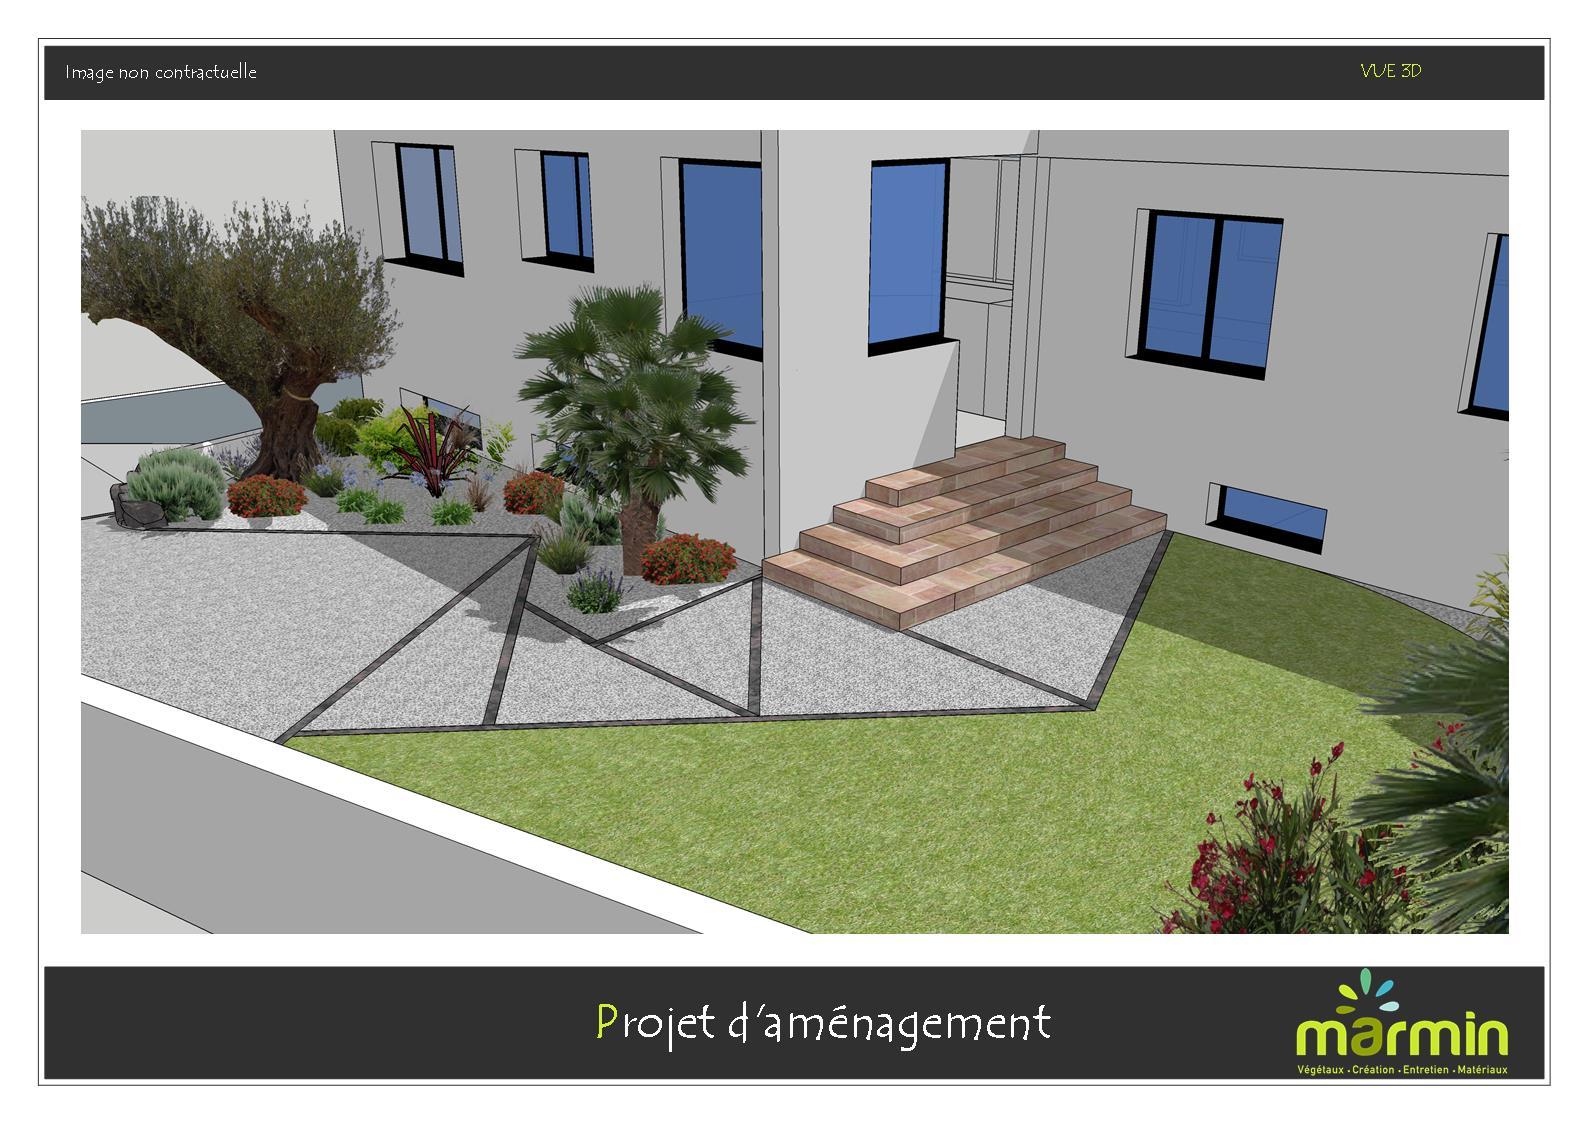 Architecte paysagiste vende les petits jardins brigitte for Architecte paysagiste prix